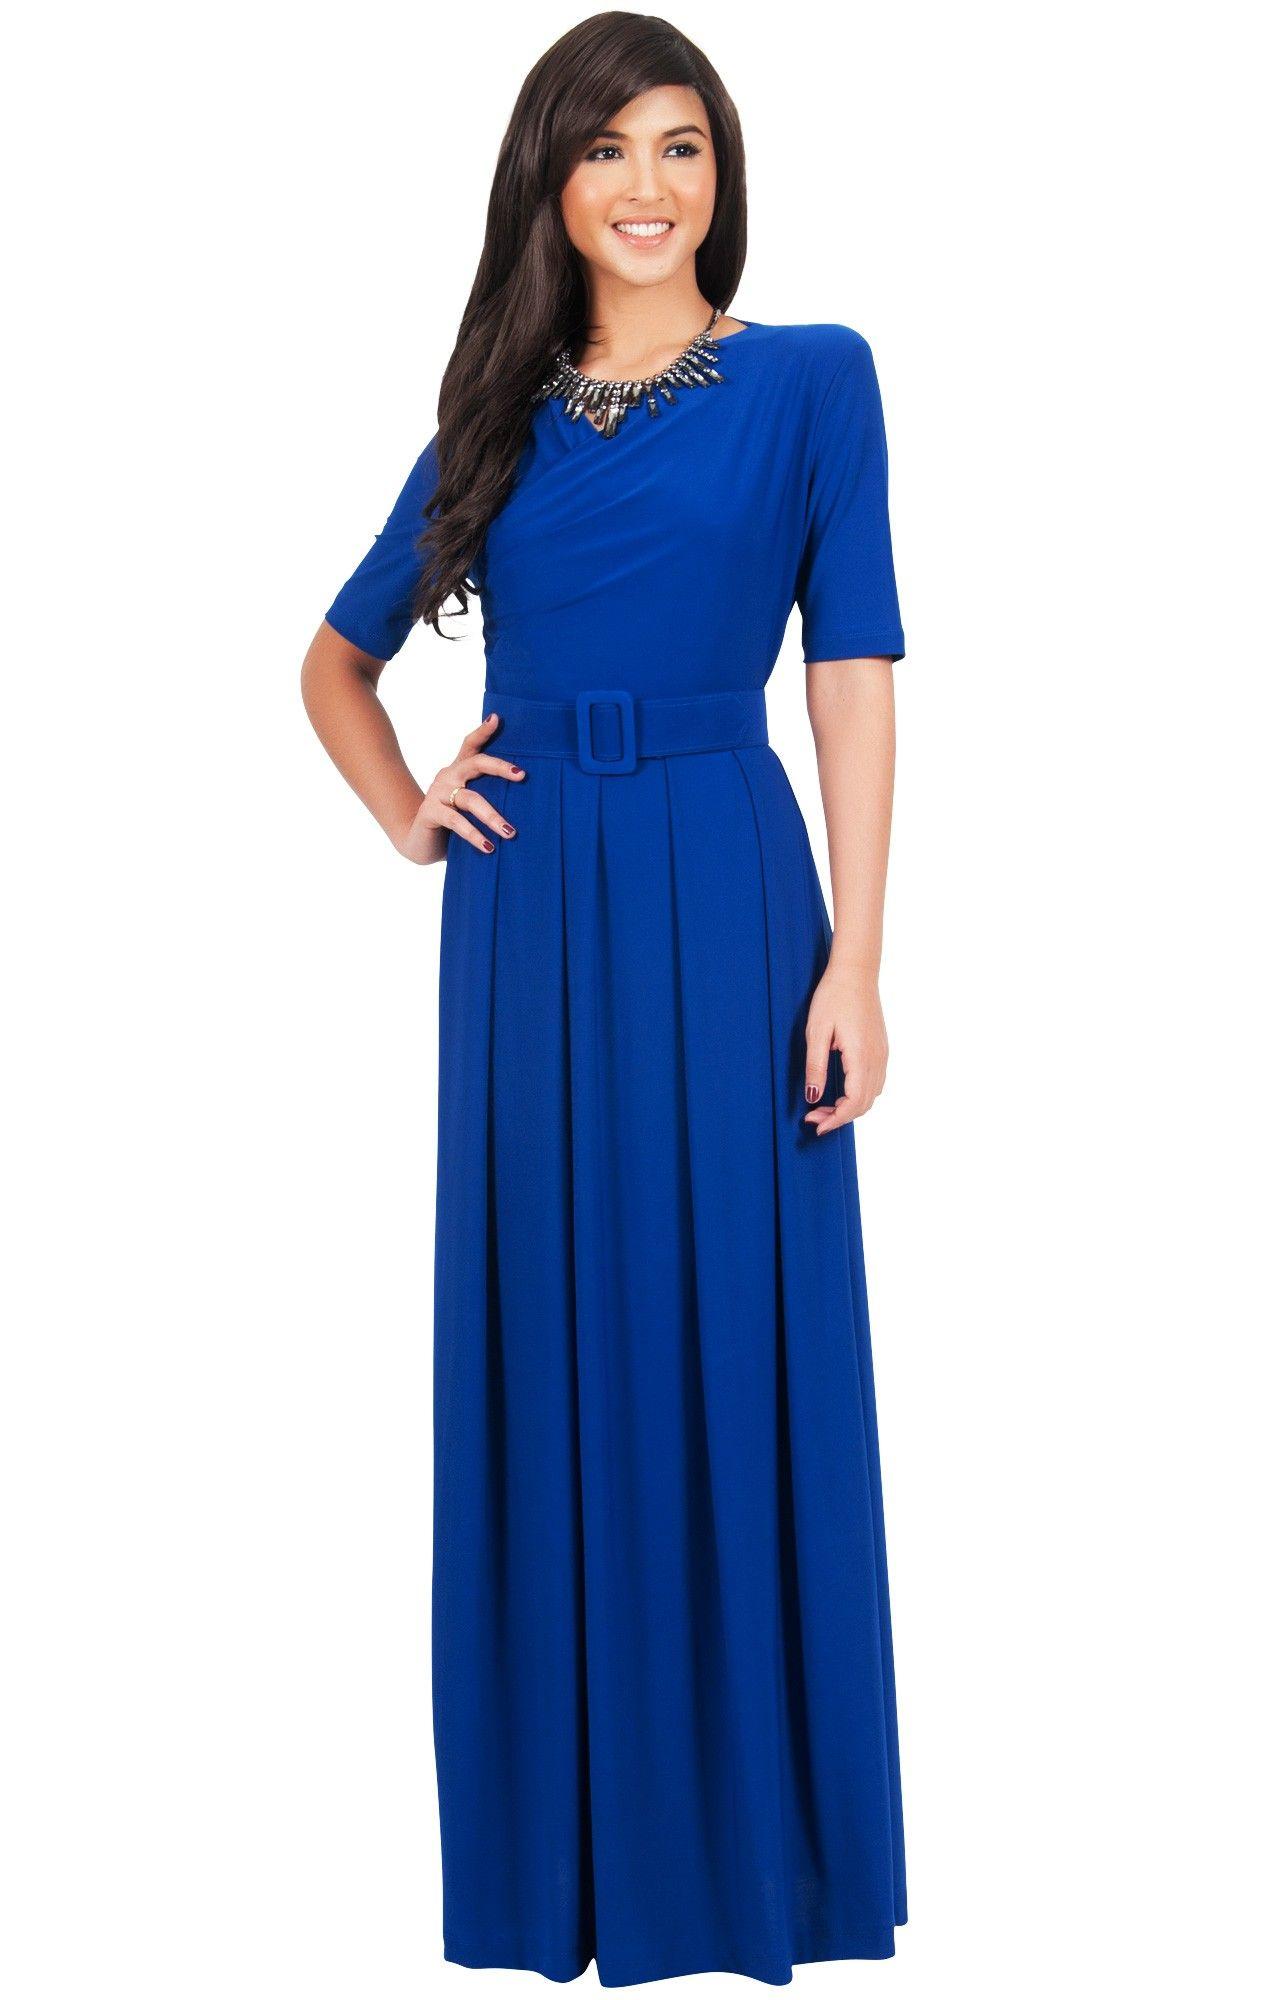 Arya long elegant modest short sleeve casual flowy maxi